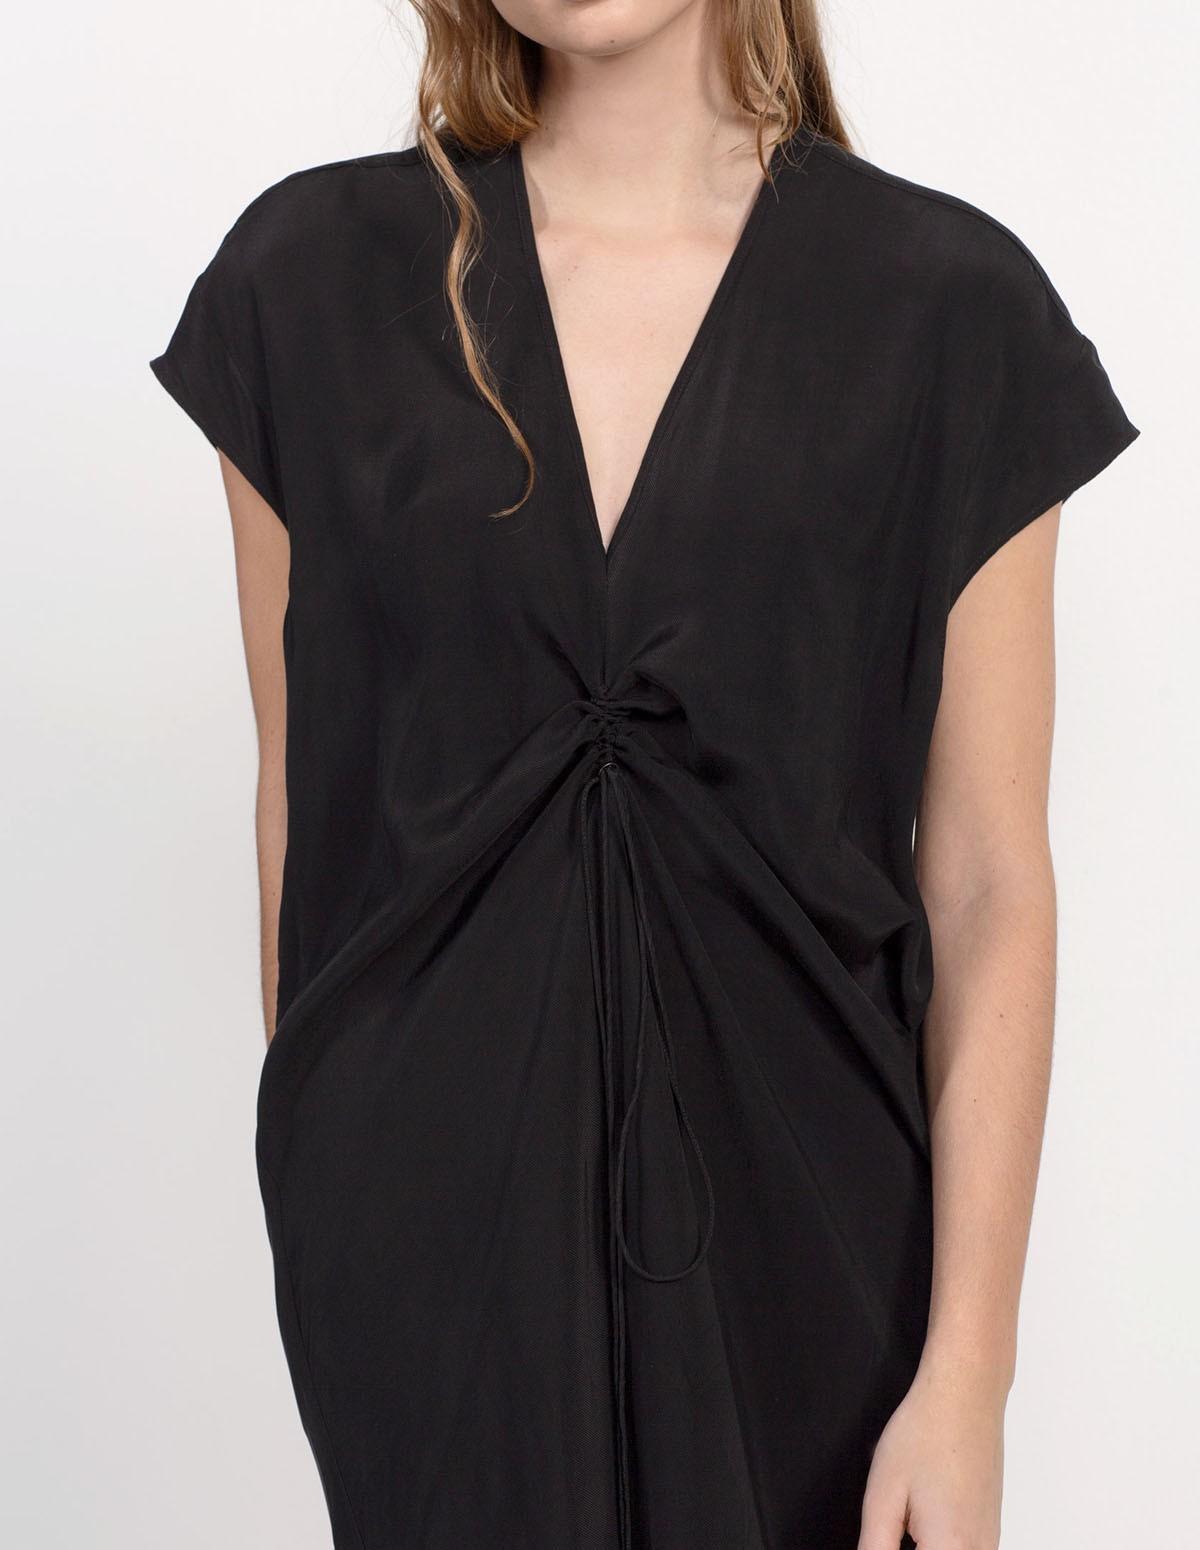 Huma Skyler Dress